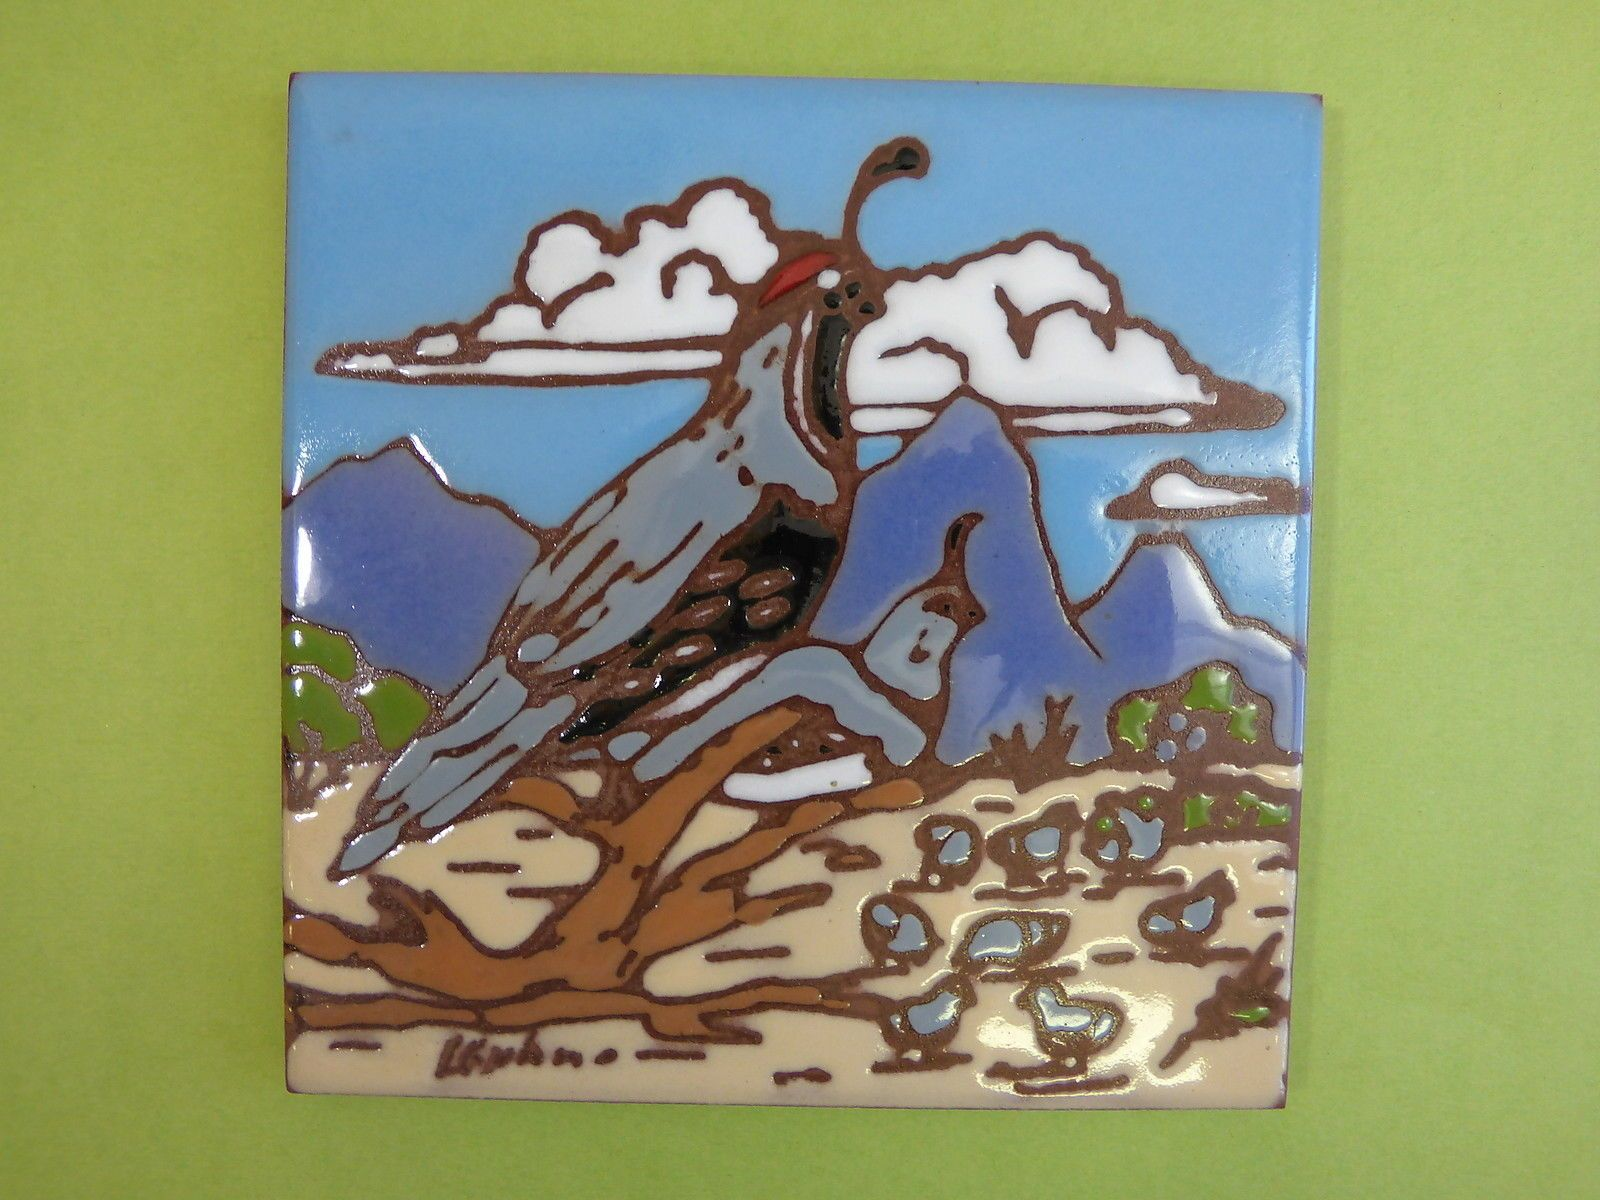 Details about Ceramic Art Tile 6x6 Southwest Rug Howling